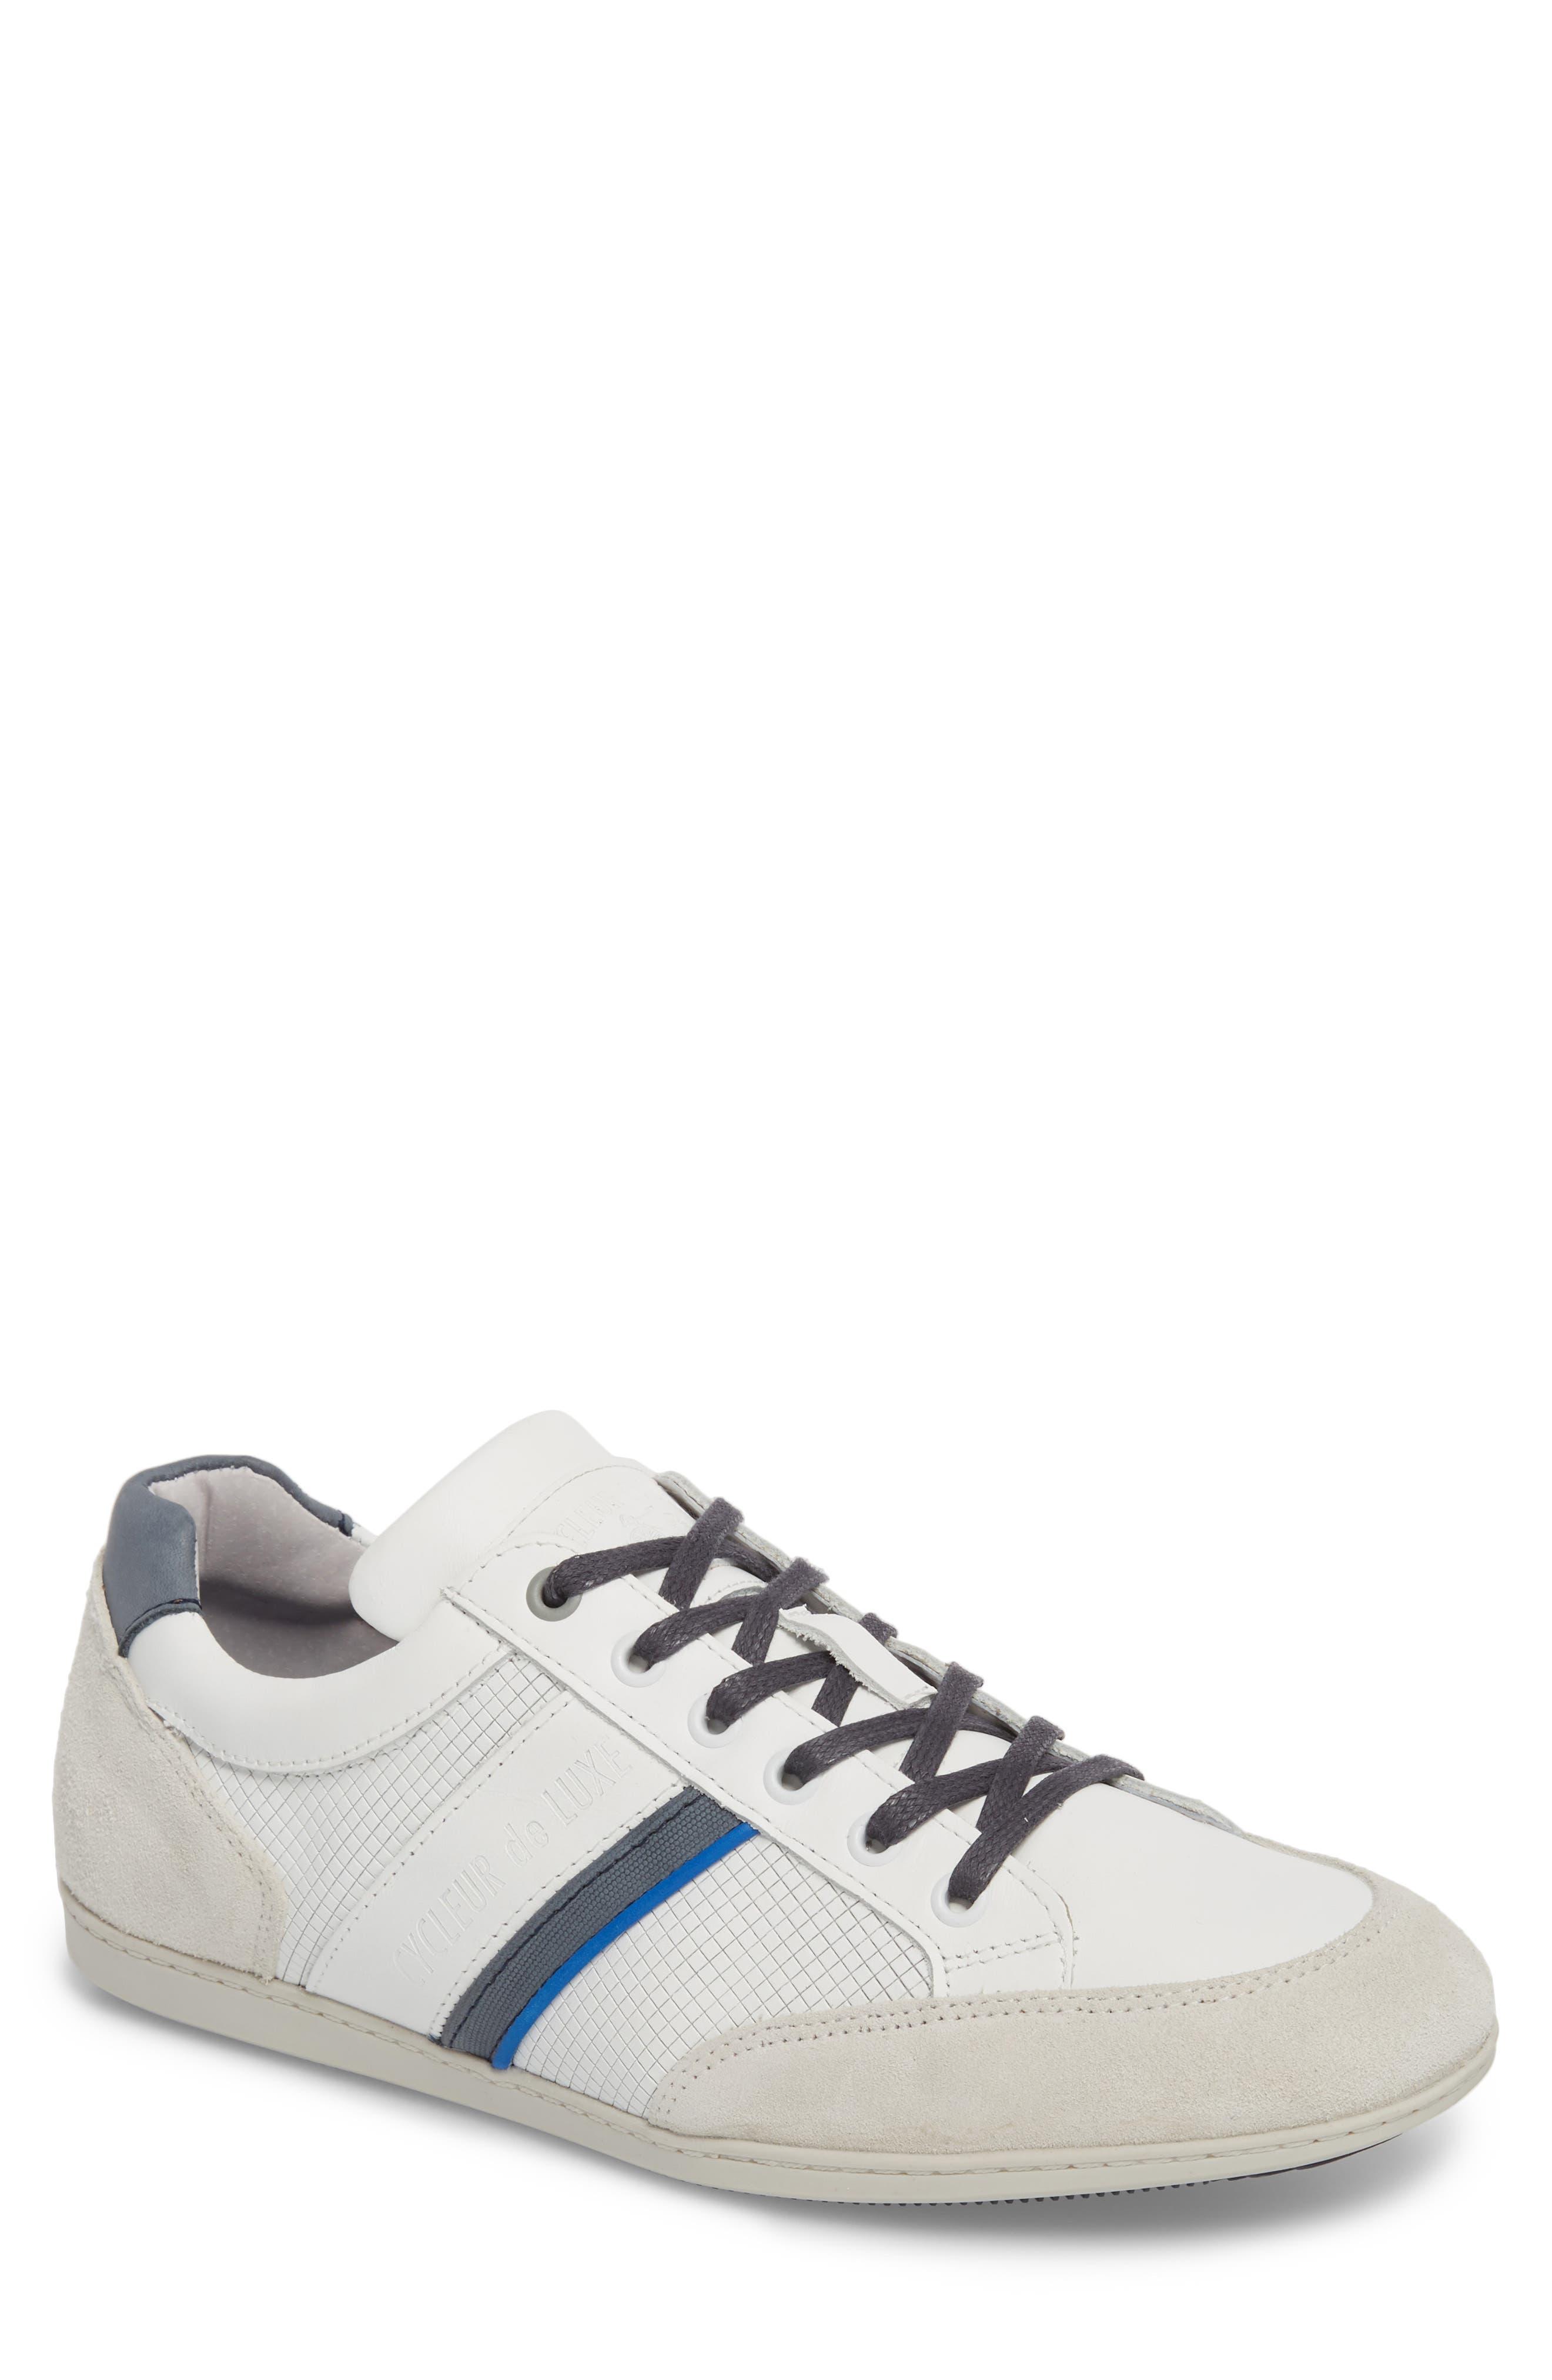 Bahamas Low Top Sneaker,                             Main thumbnail 1, color,                             100